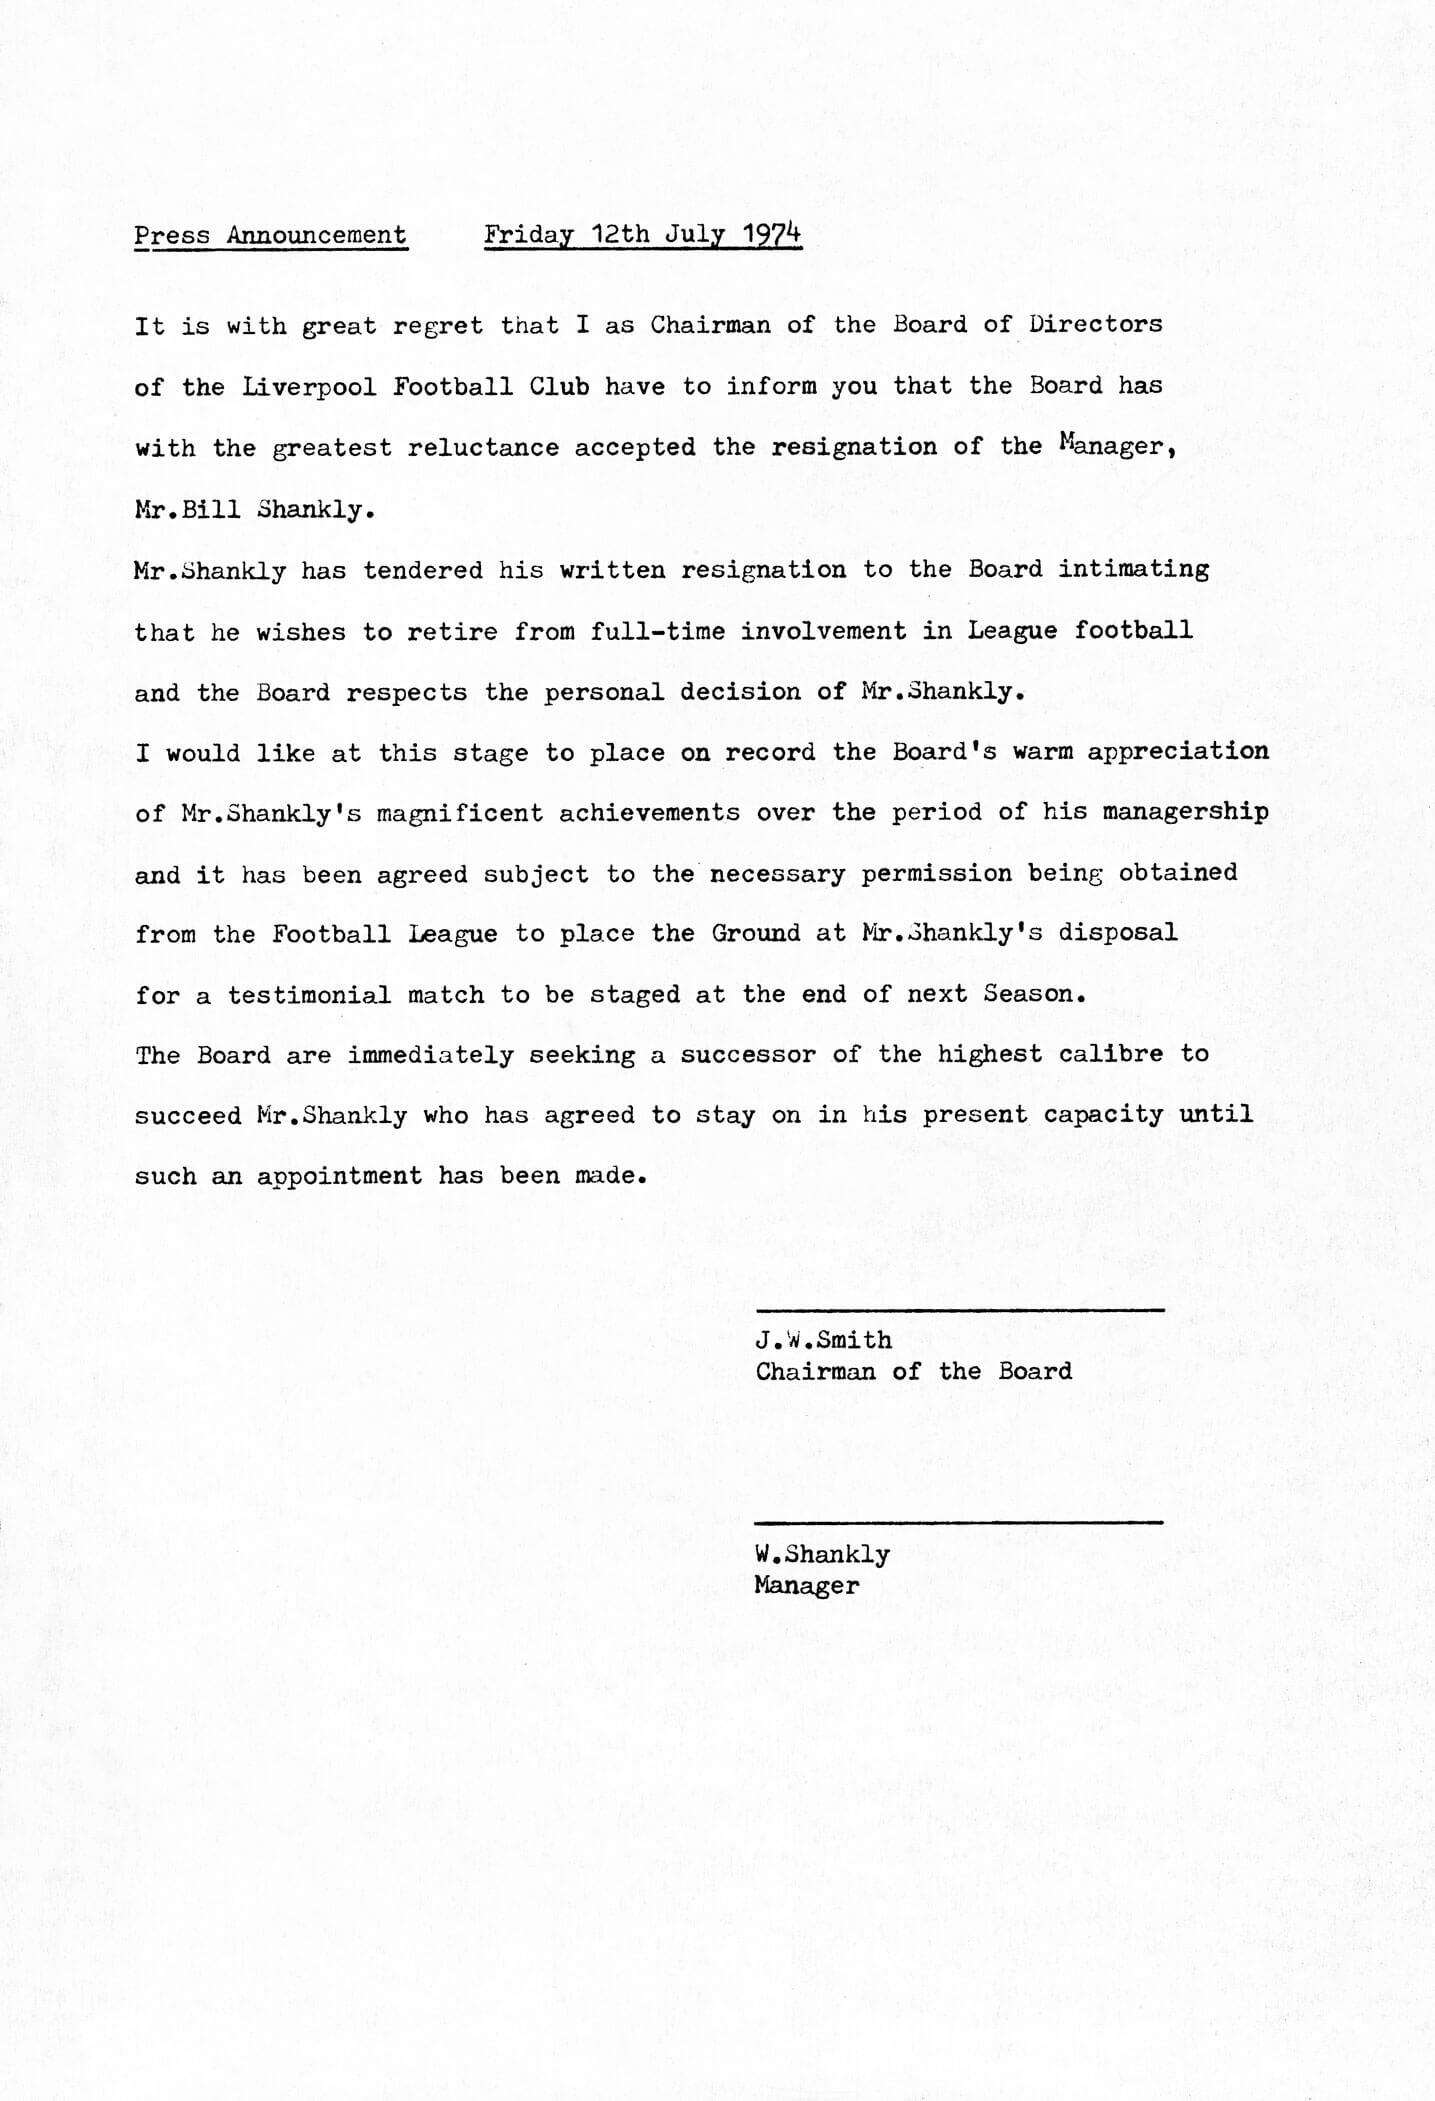 Bill Shankly's Resignation